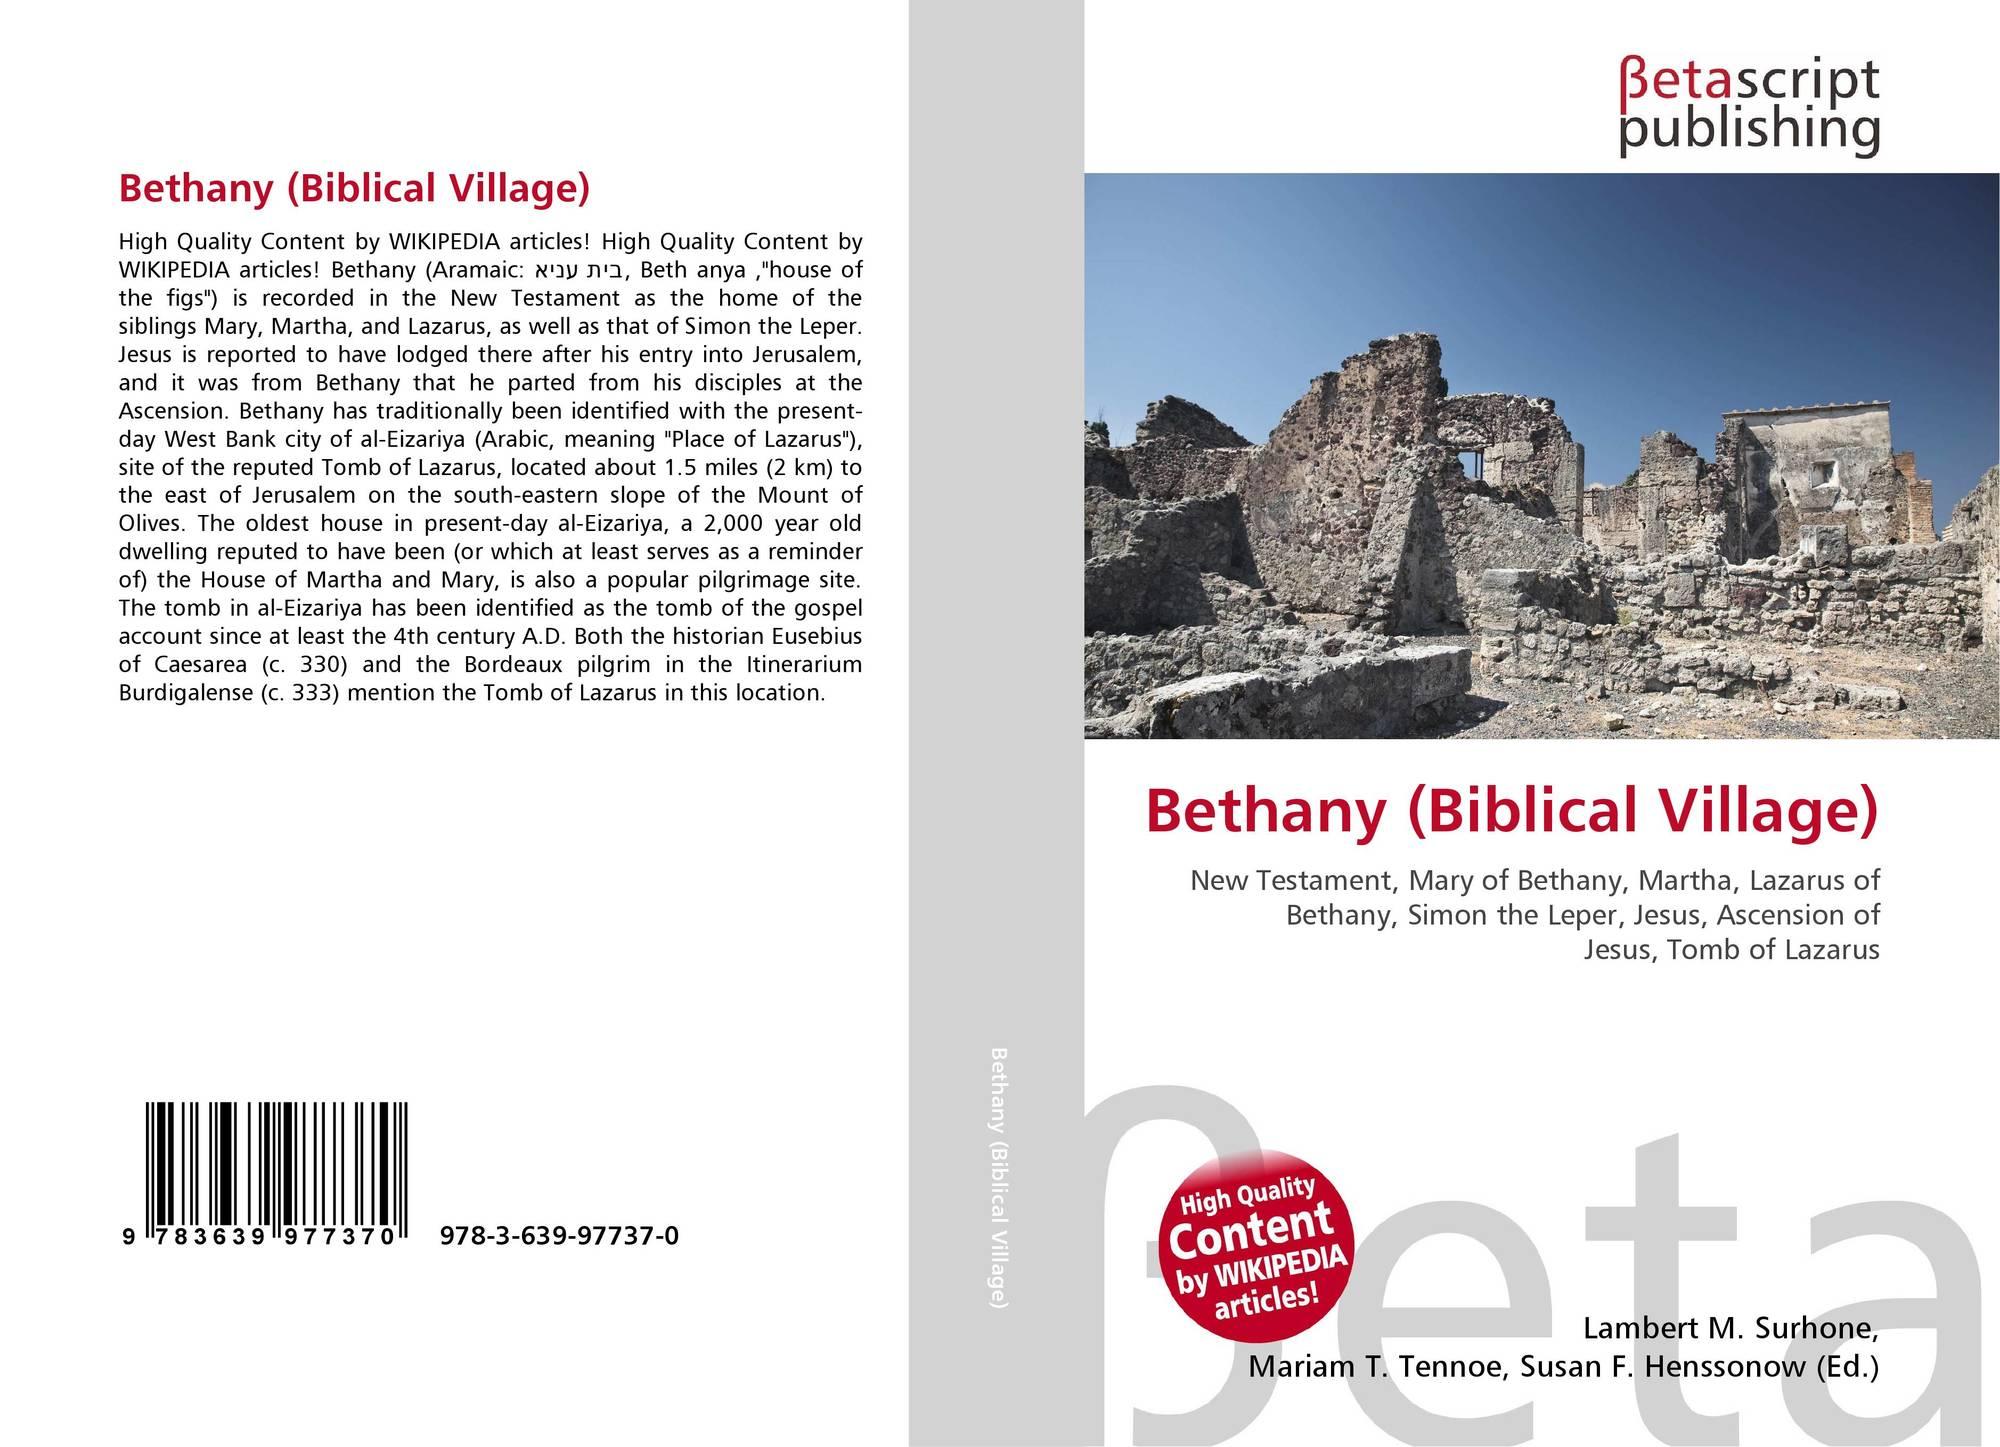 Bethany (Biblical Village), 978-3-639-97737-0, 3639977378